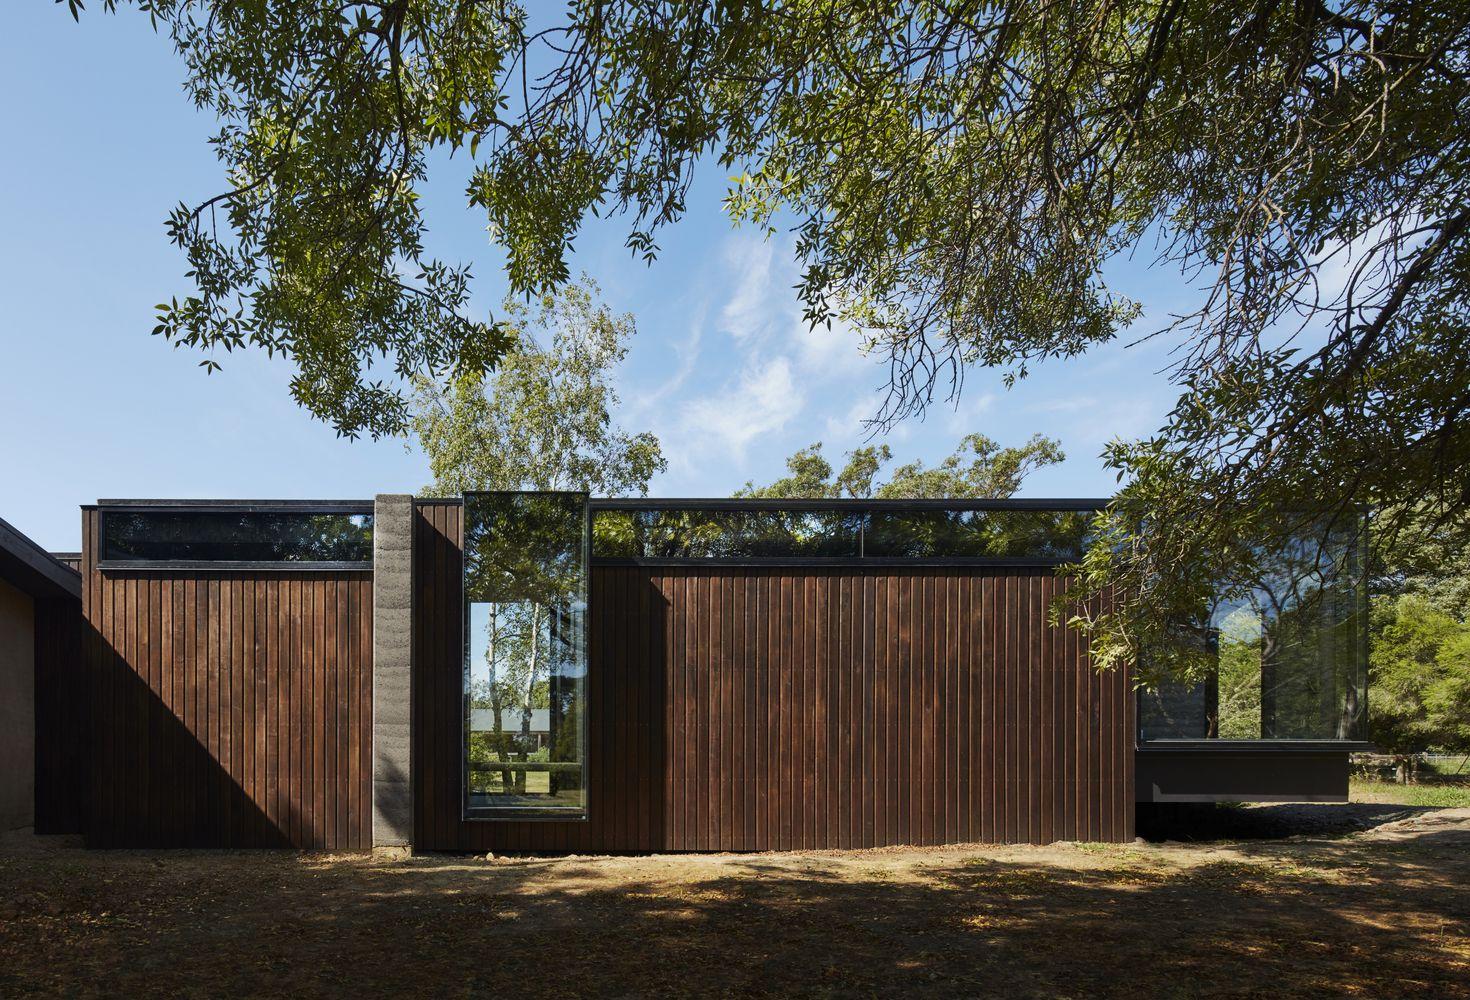 Galeria De Pavilhao Entre Arvores Branch Studio Architects 13 Pavilion Design Facade Architecture Studios Architecture